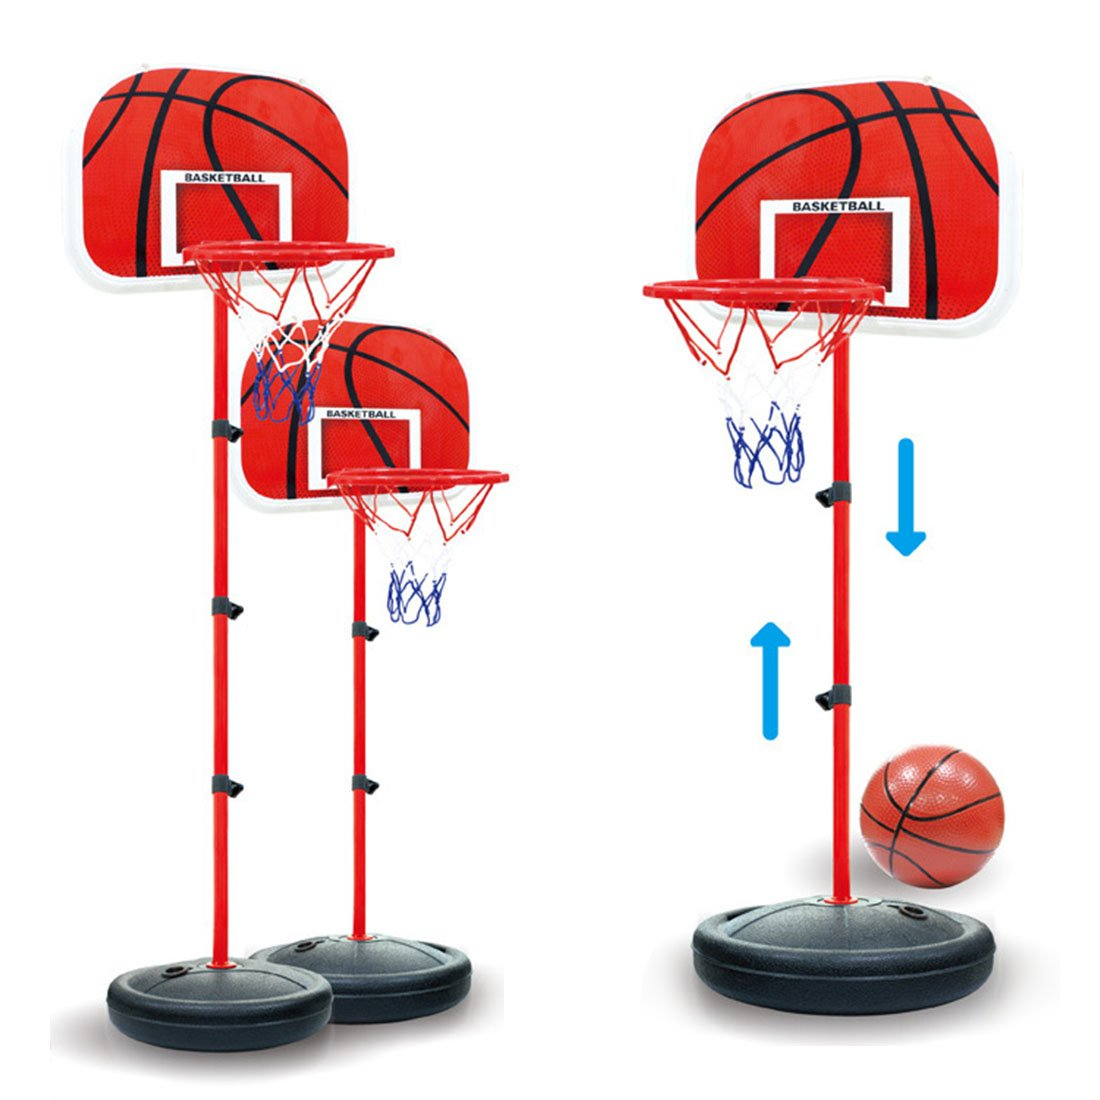 LDB SHOP 63-150 Cm Ajustable aro de Baloncesto ni/ño Tablero Baloncesto Canasta Baloncesto Infantil